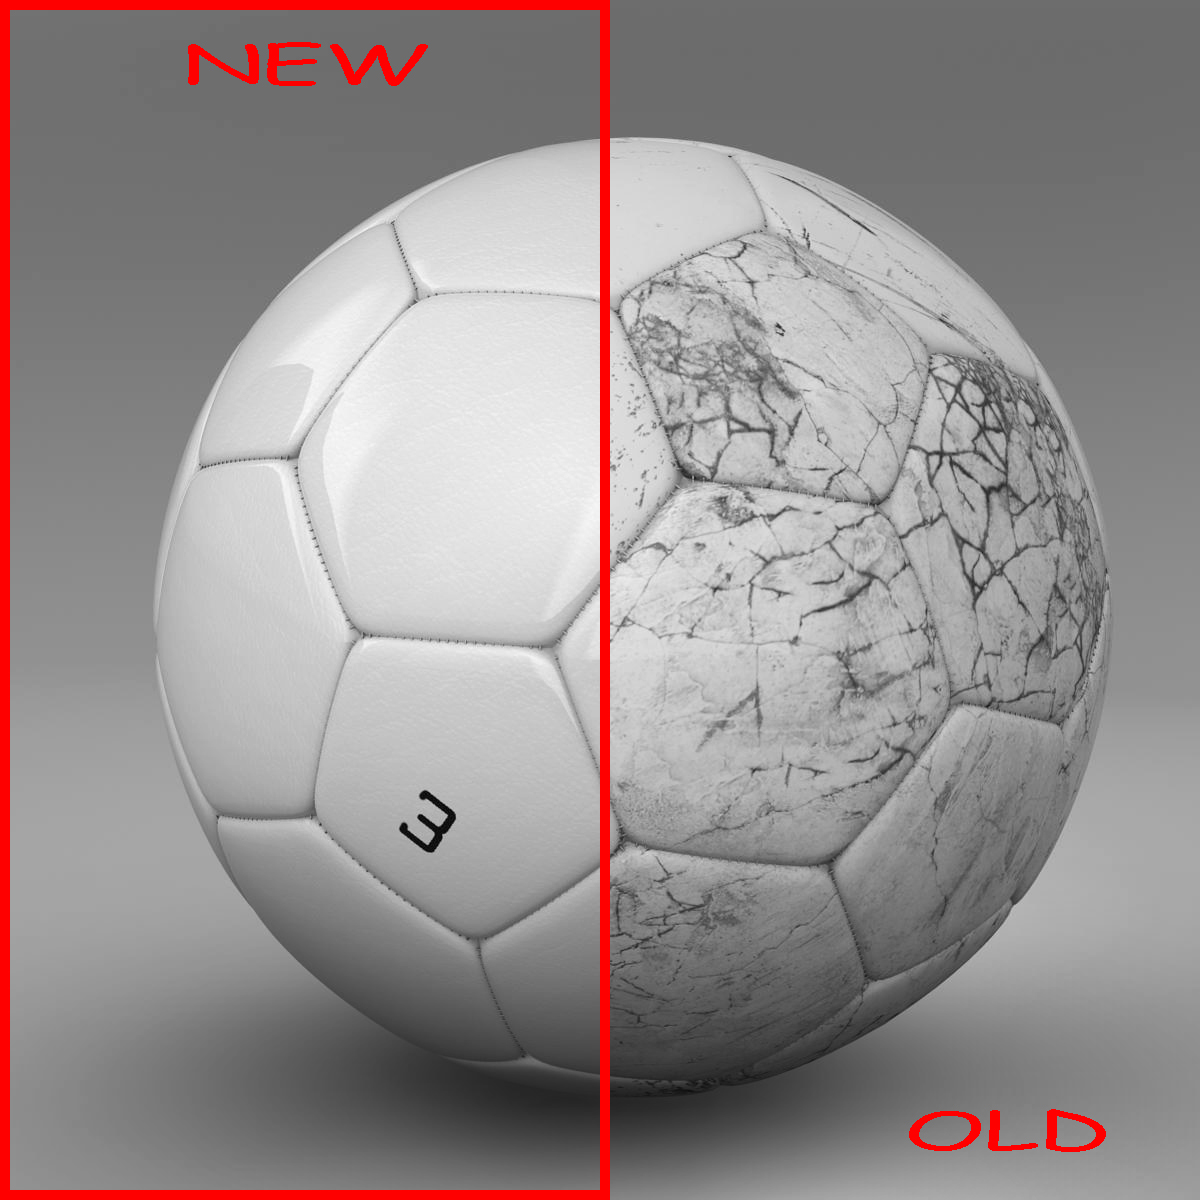 soccerball white 3d model 3ds max fbx c4d ma mb obj 205177